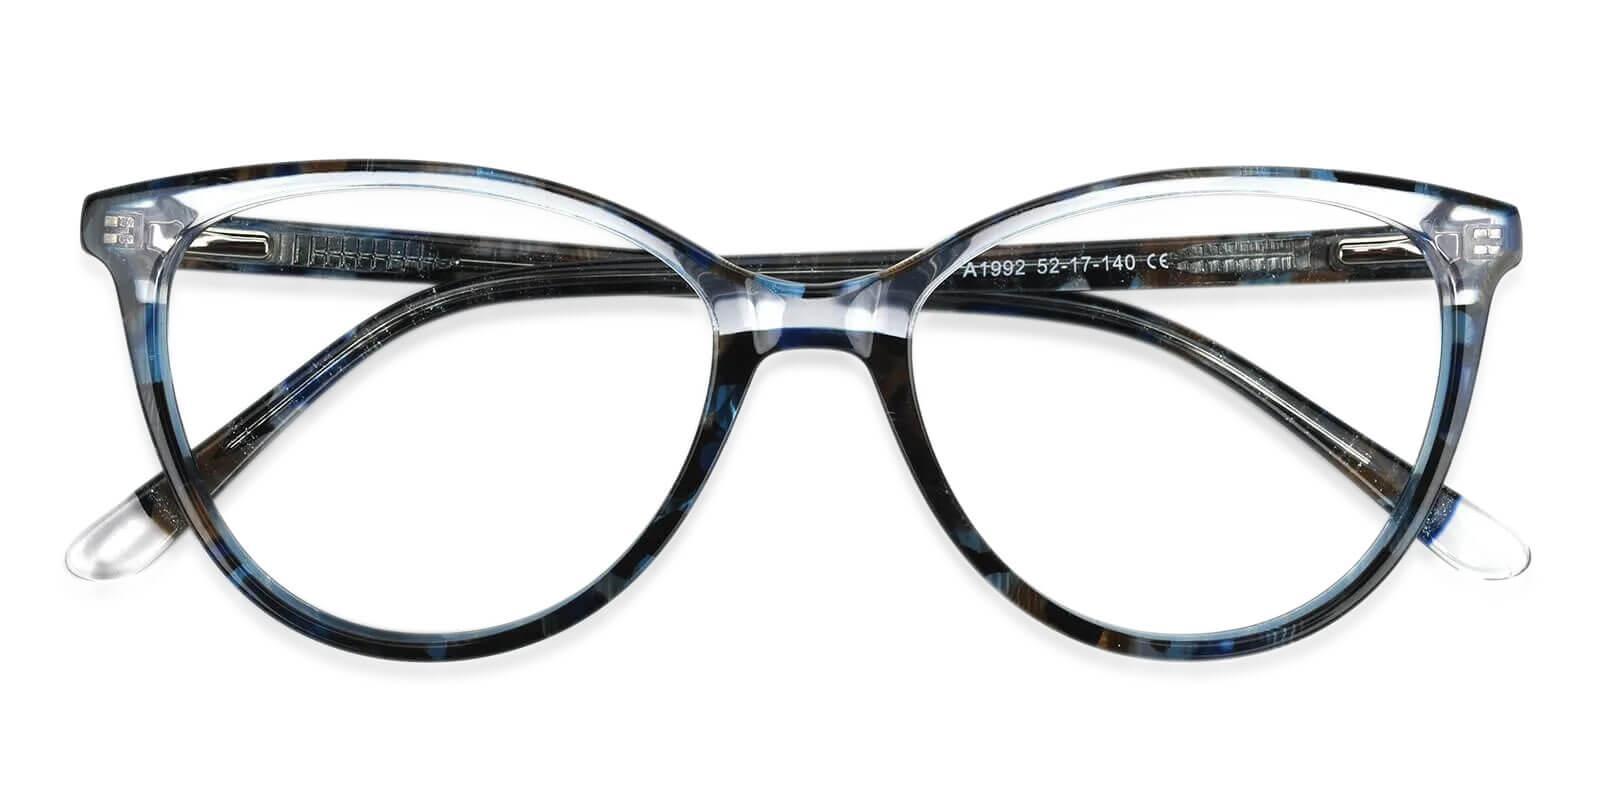 Magnus Multicolor Acetate Eyeglasses , SpringHinges , UniversalBridgeFit Frames from ABBE Glasses